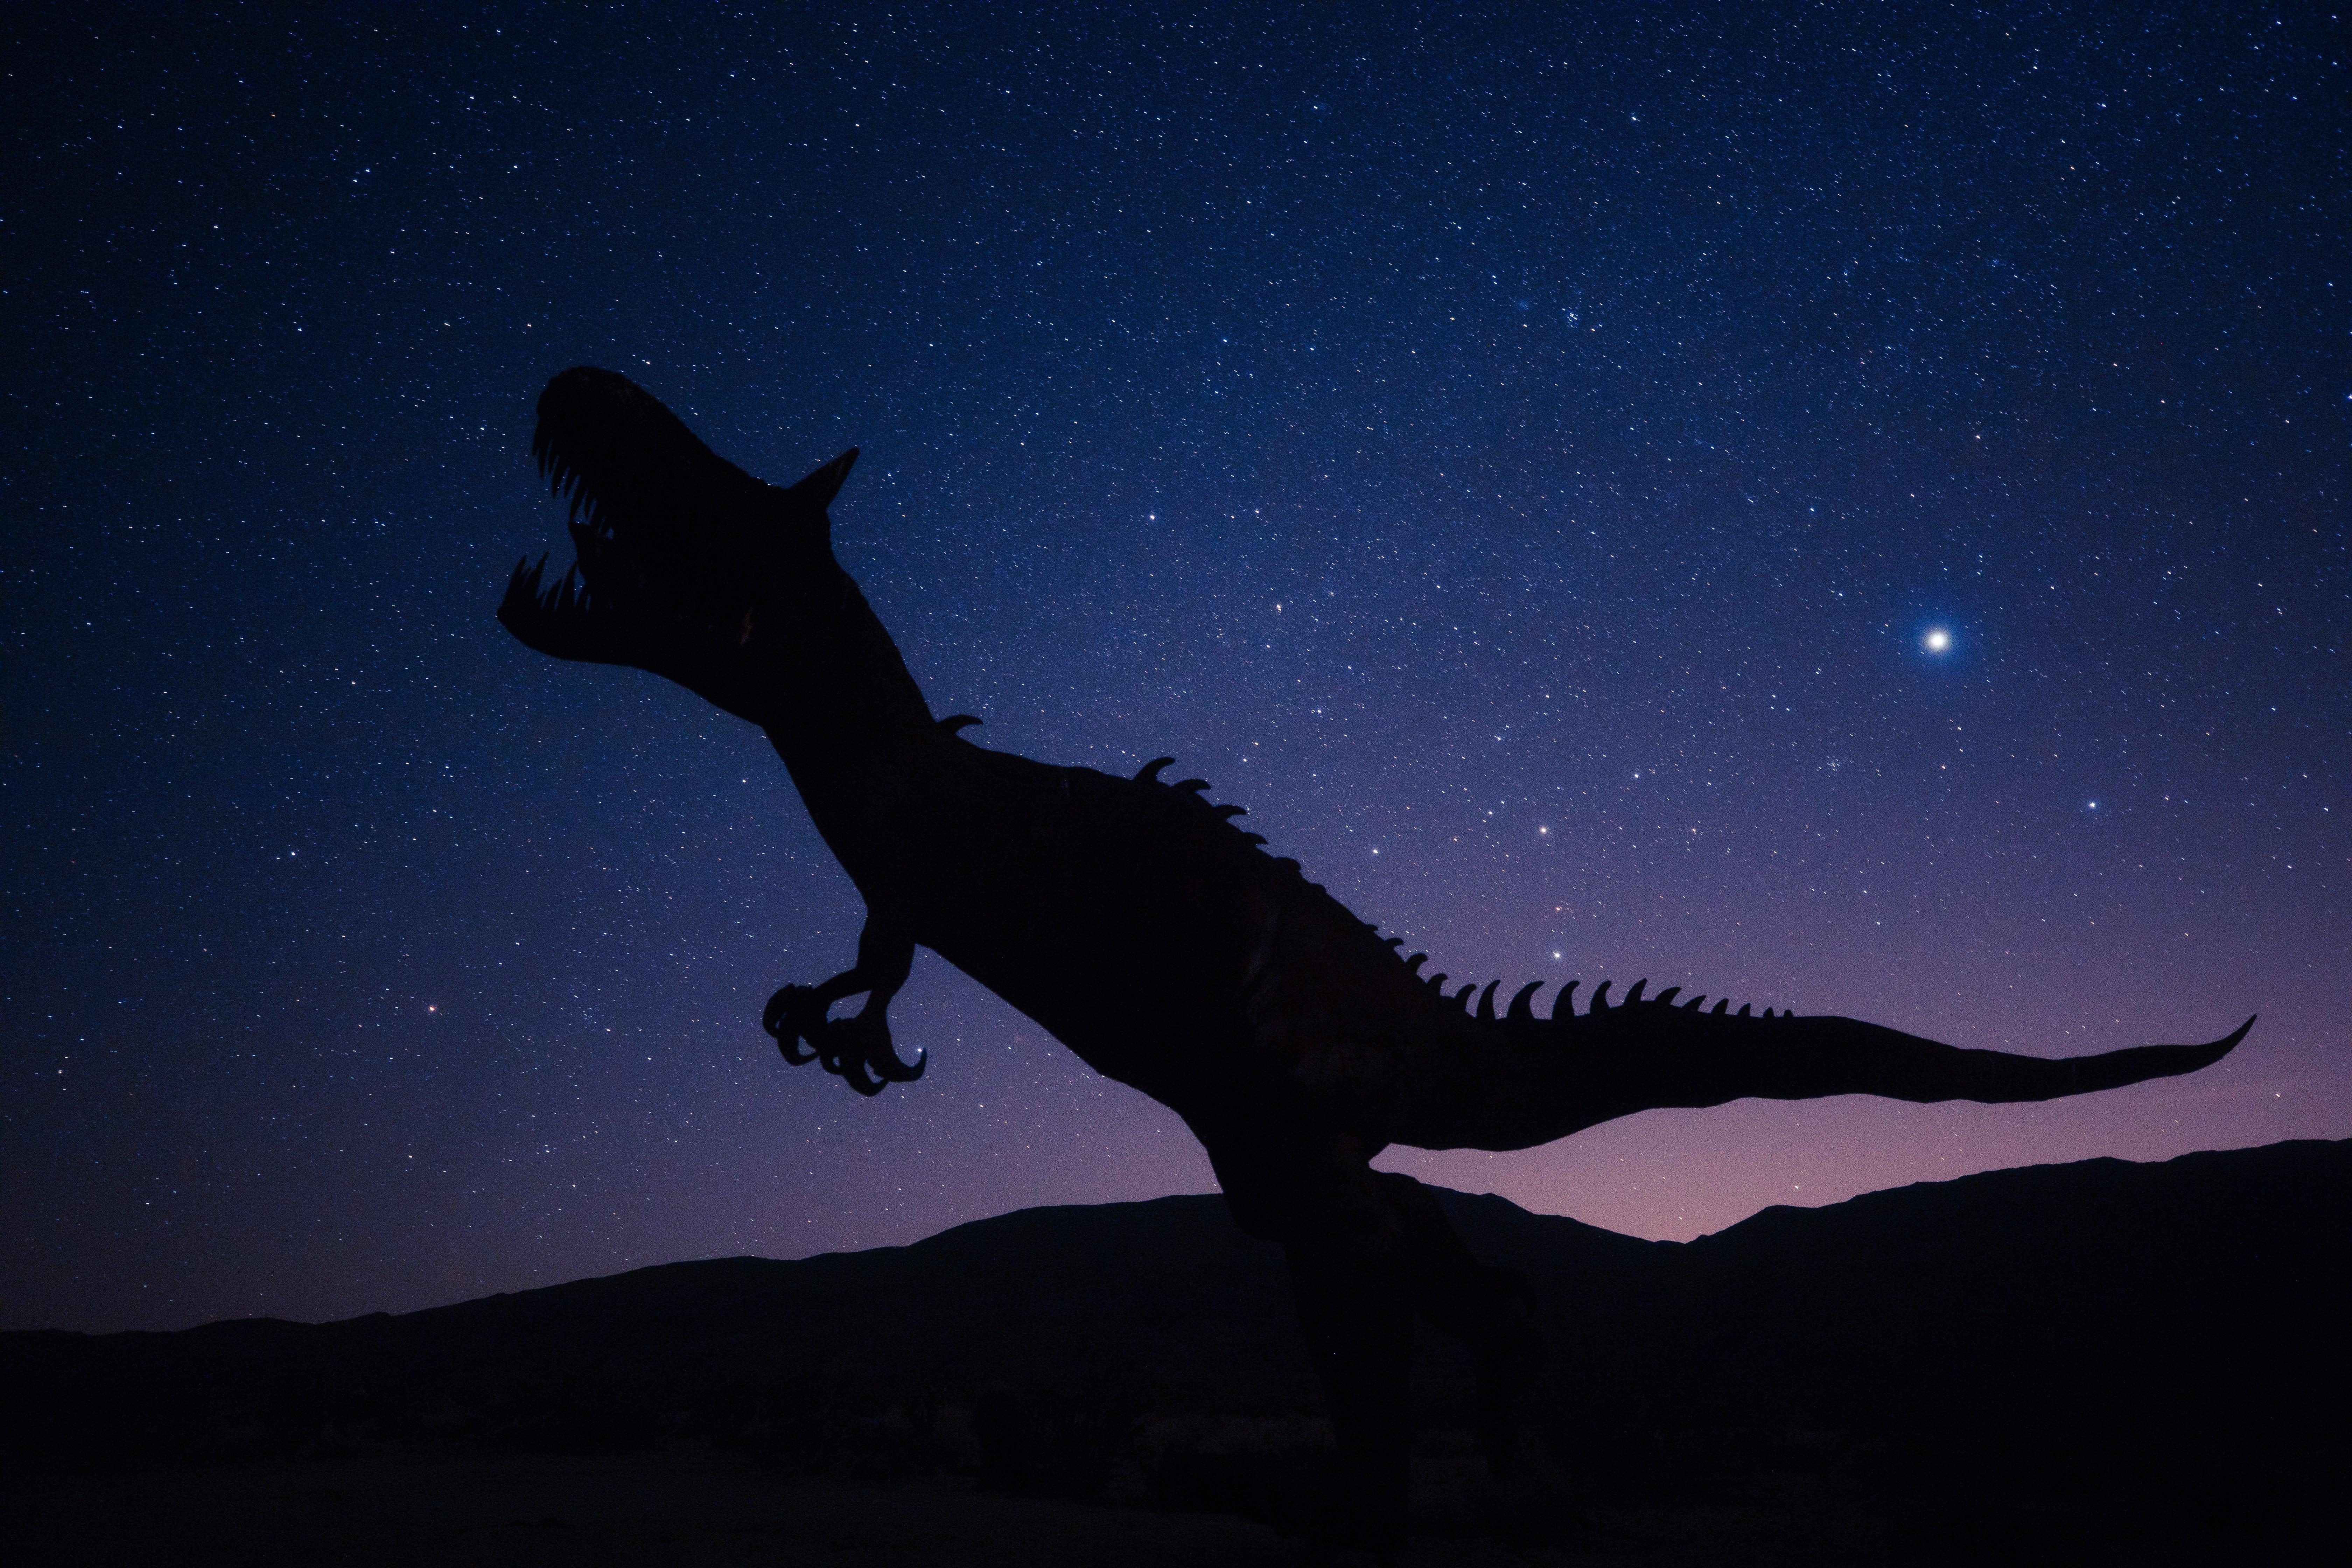 Asteroïde - origine extinction dinosaures